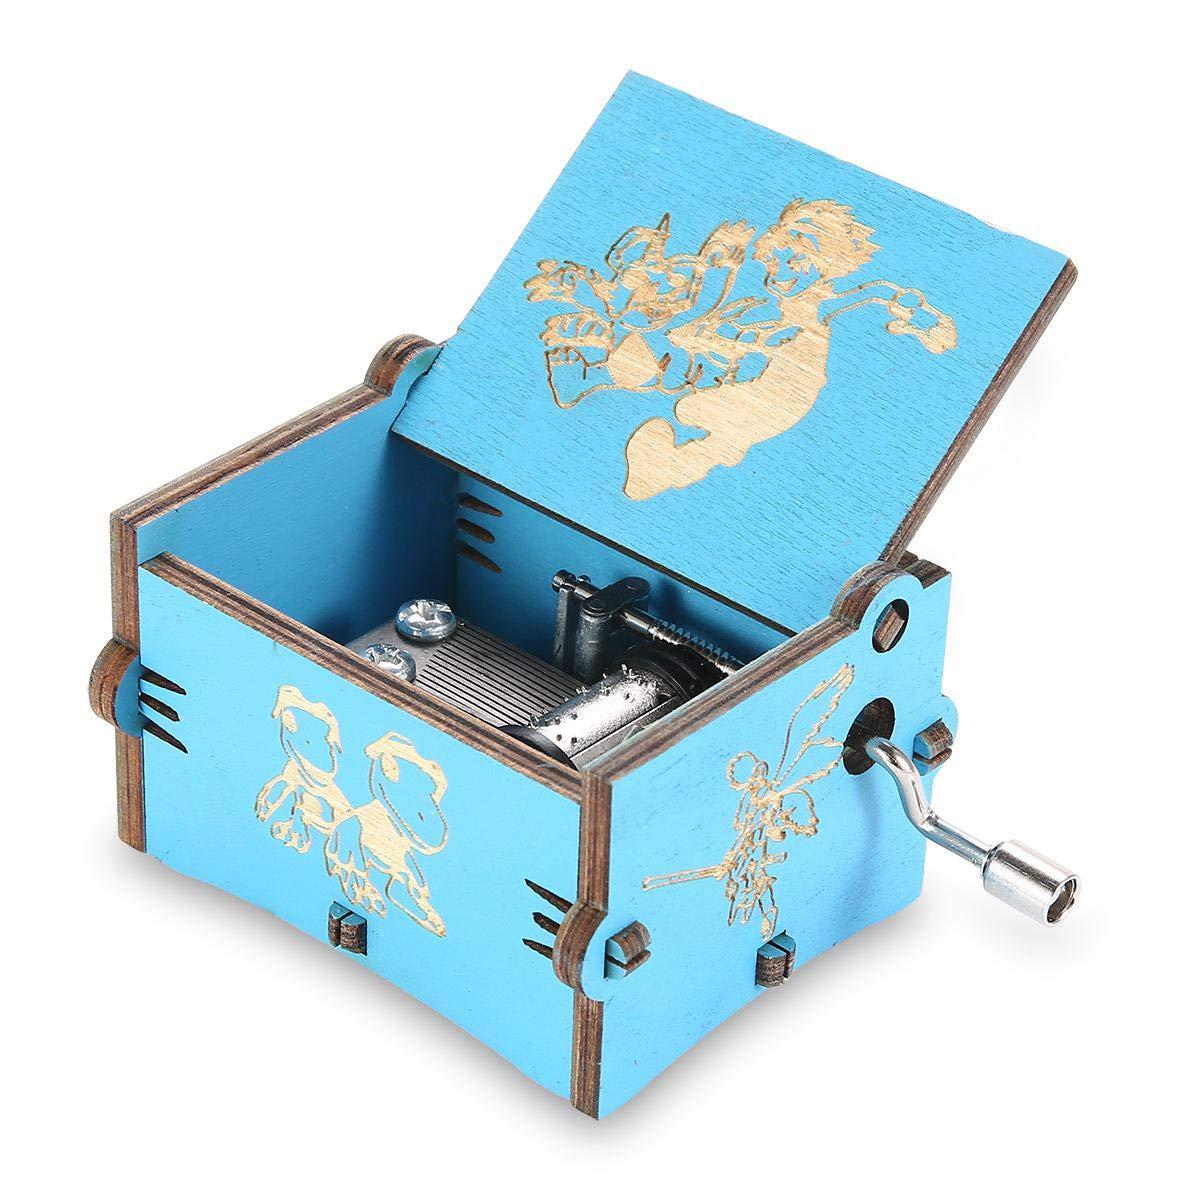 MOGOI Caja de música de Madera, manivela de Mano, Caja Musical de Madera Tallada clásica, Regalo para niños, Familia y Amigos: Amazon.es: Hogar